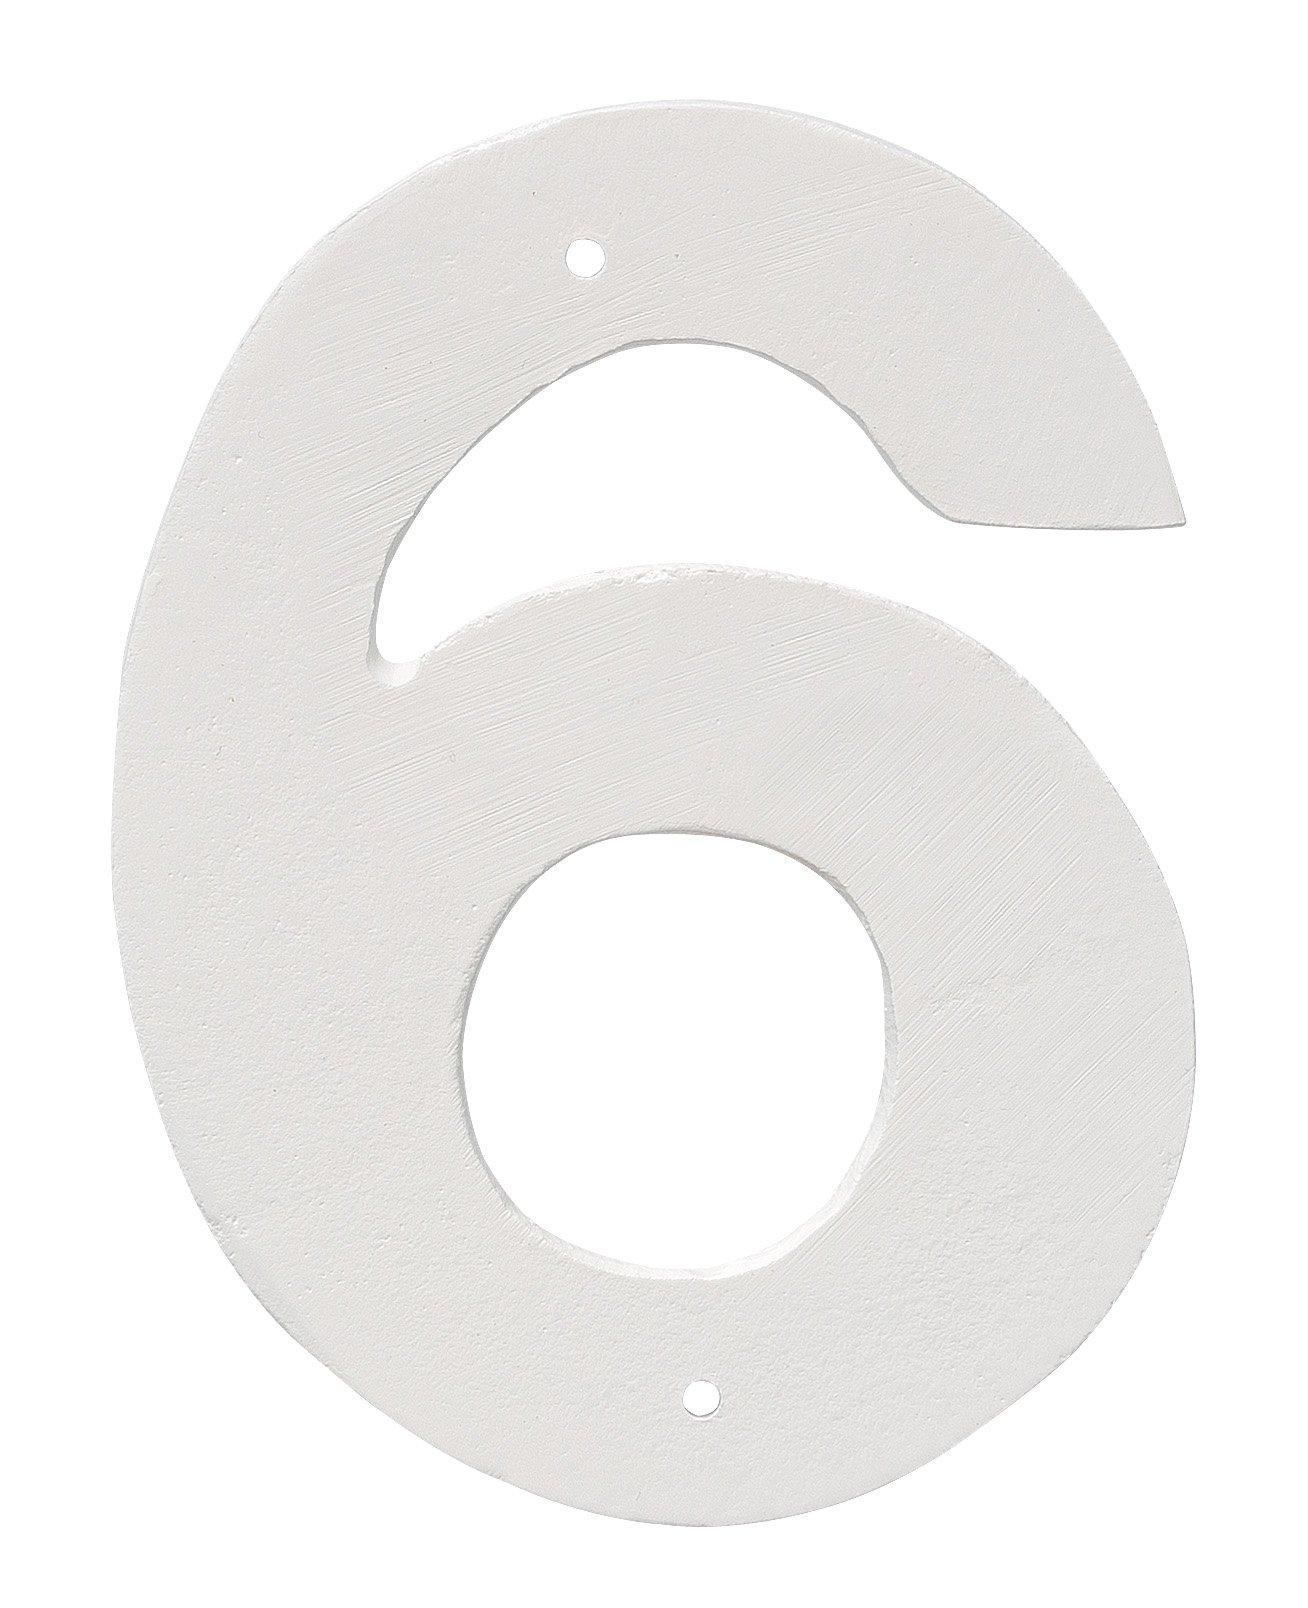 Montague Metal Products 8'' Aluminum House Number 6 Outdoor Plaque, Medium, White